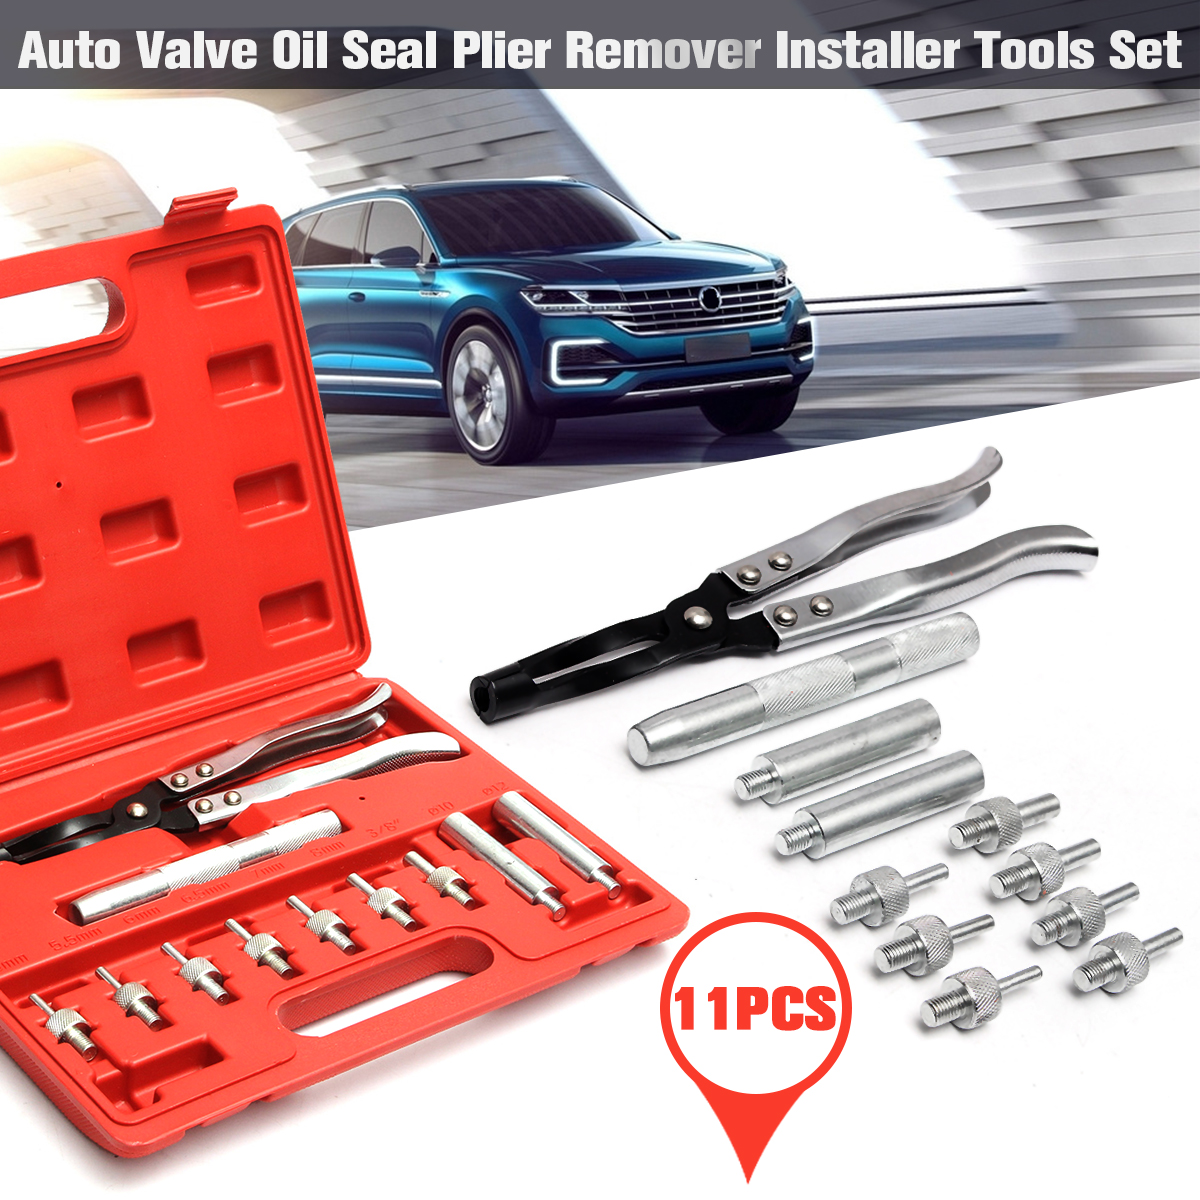 Audew 11Pcs Auto Vehicle Automotive Valve Oil Seal Plier Remover Installer Tools Set Car Garage Kit Heavy Duty Tire Repair Tools